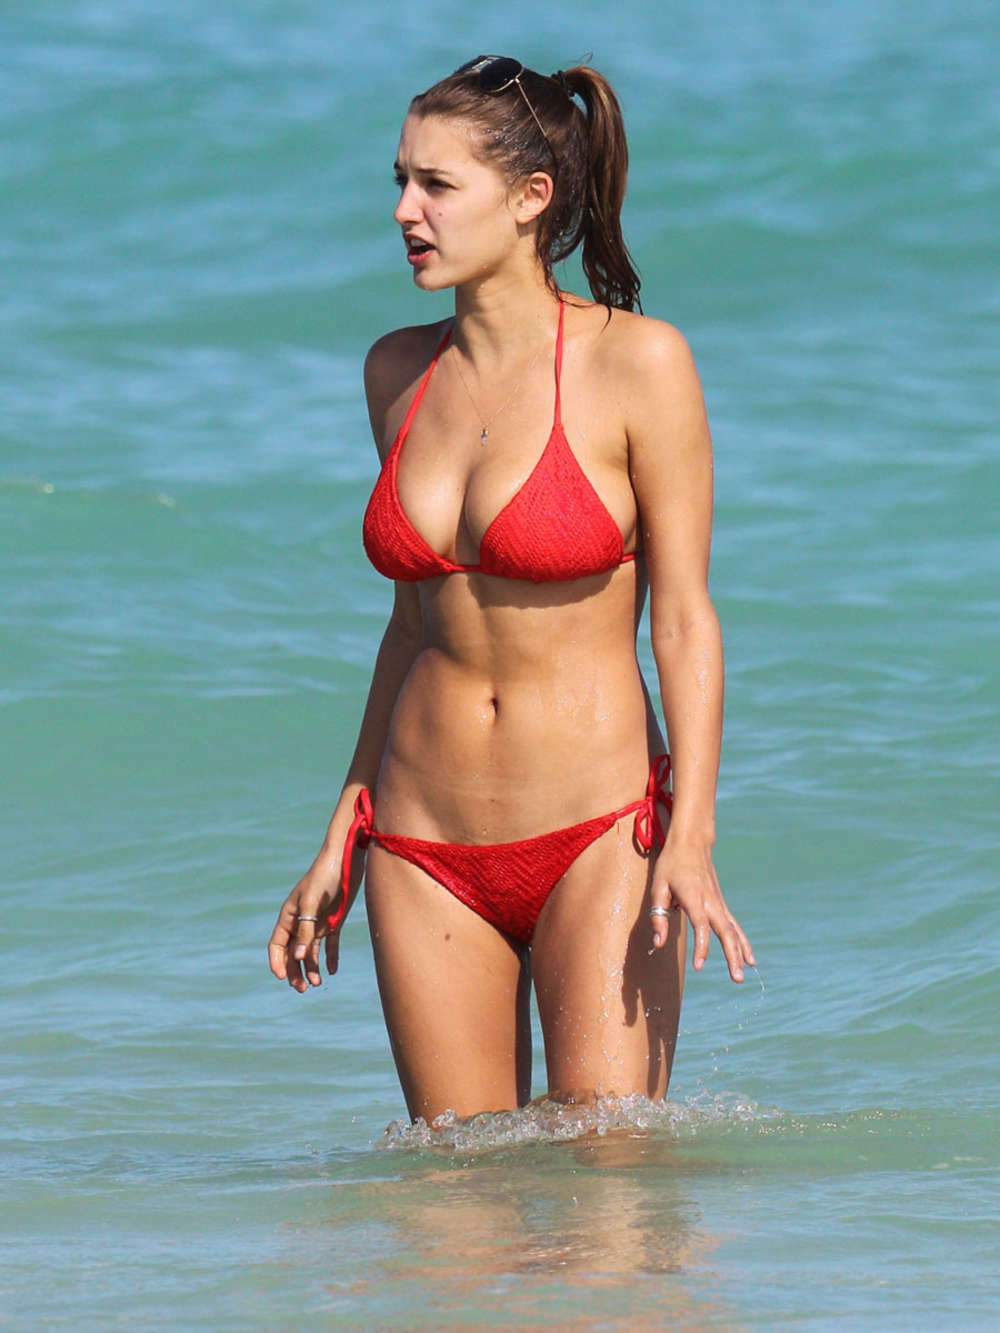 Alyssa Arce 2013 : Alyssa Arce Hot Bikini Photos: Miami -03